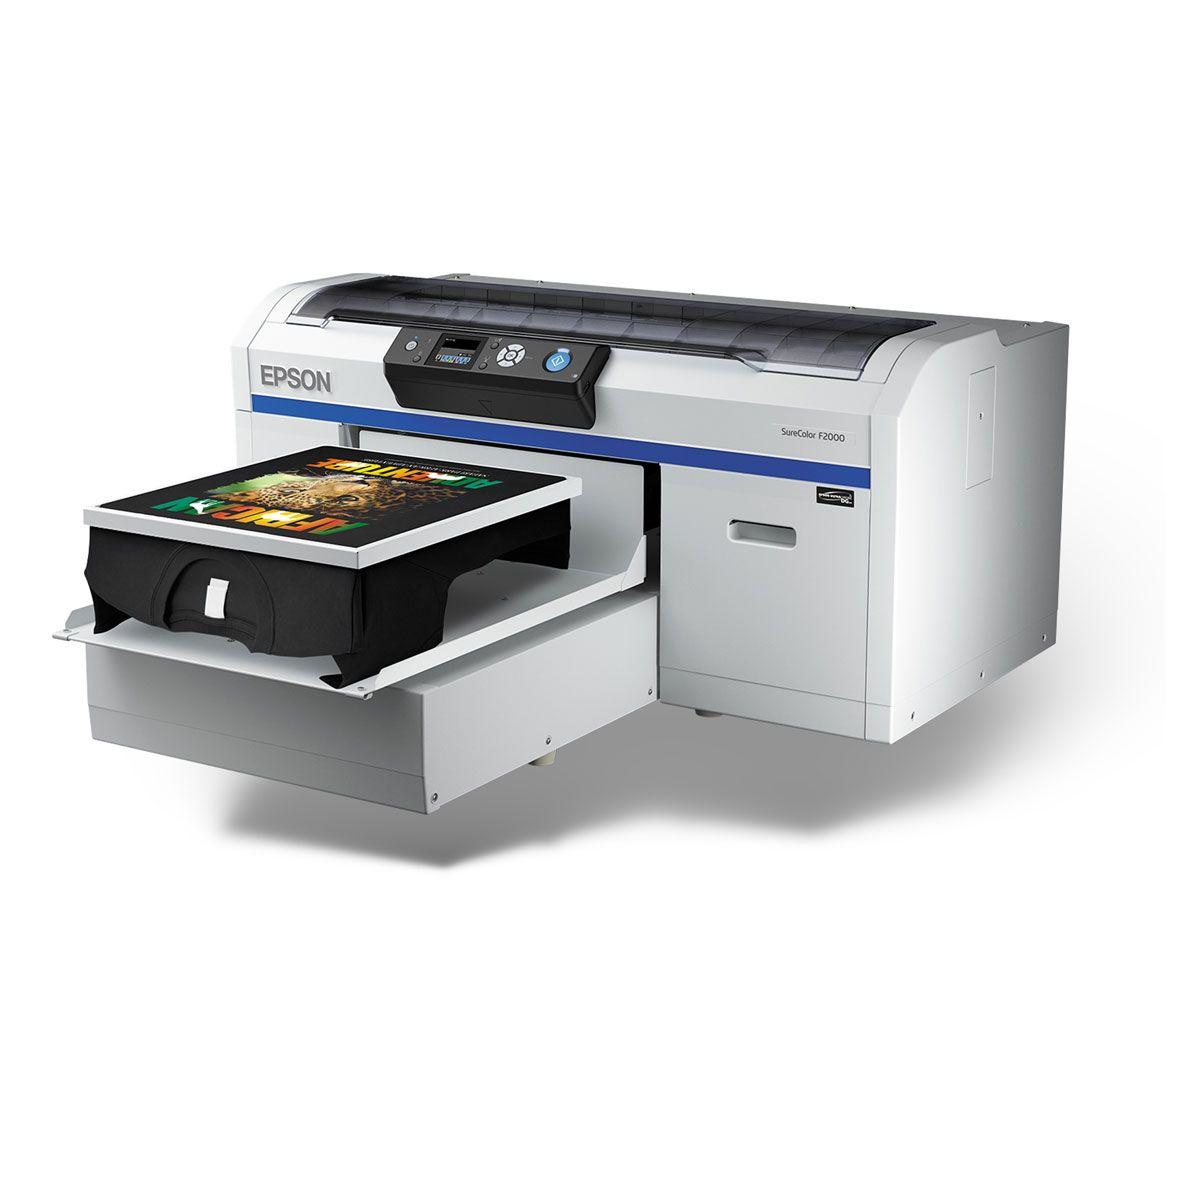 Epson Surecolor F2100 Dtg Printer White Edition Printer Epson Tshirt Business